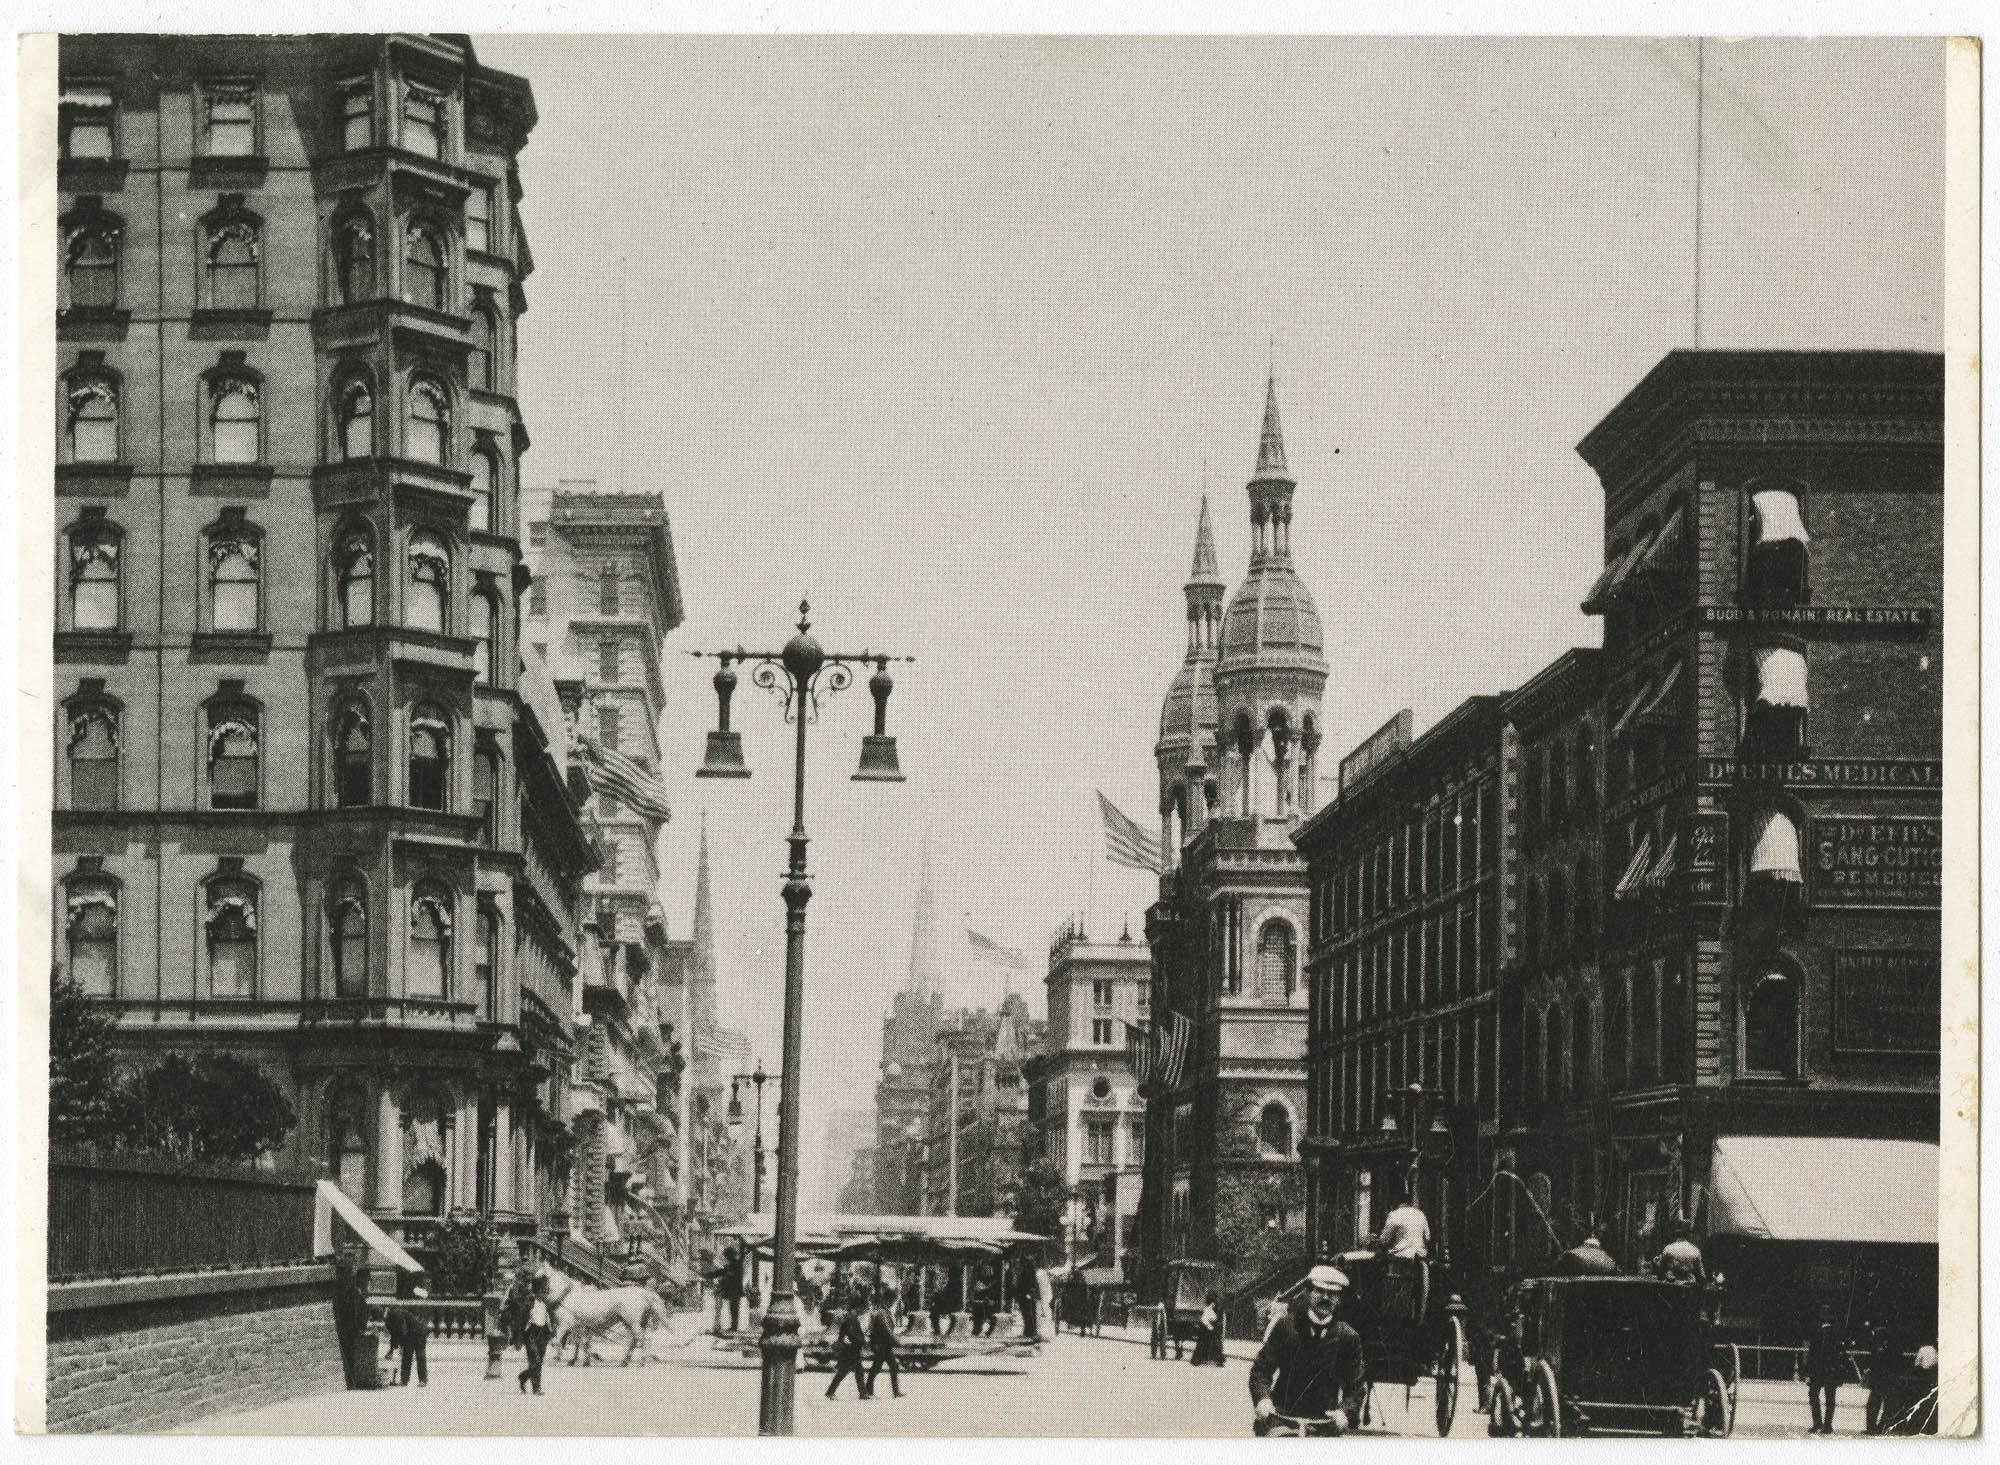 New York, c. 1893. Fifth Avenue, 42nd Street